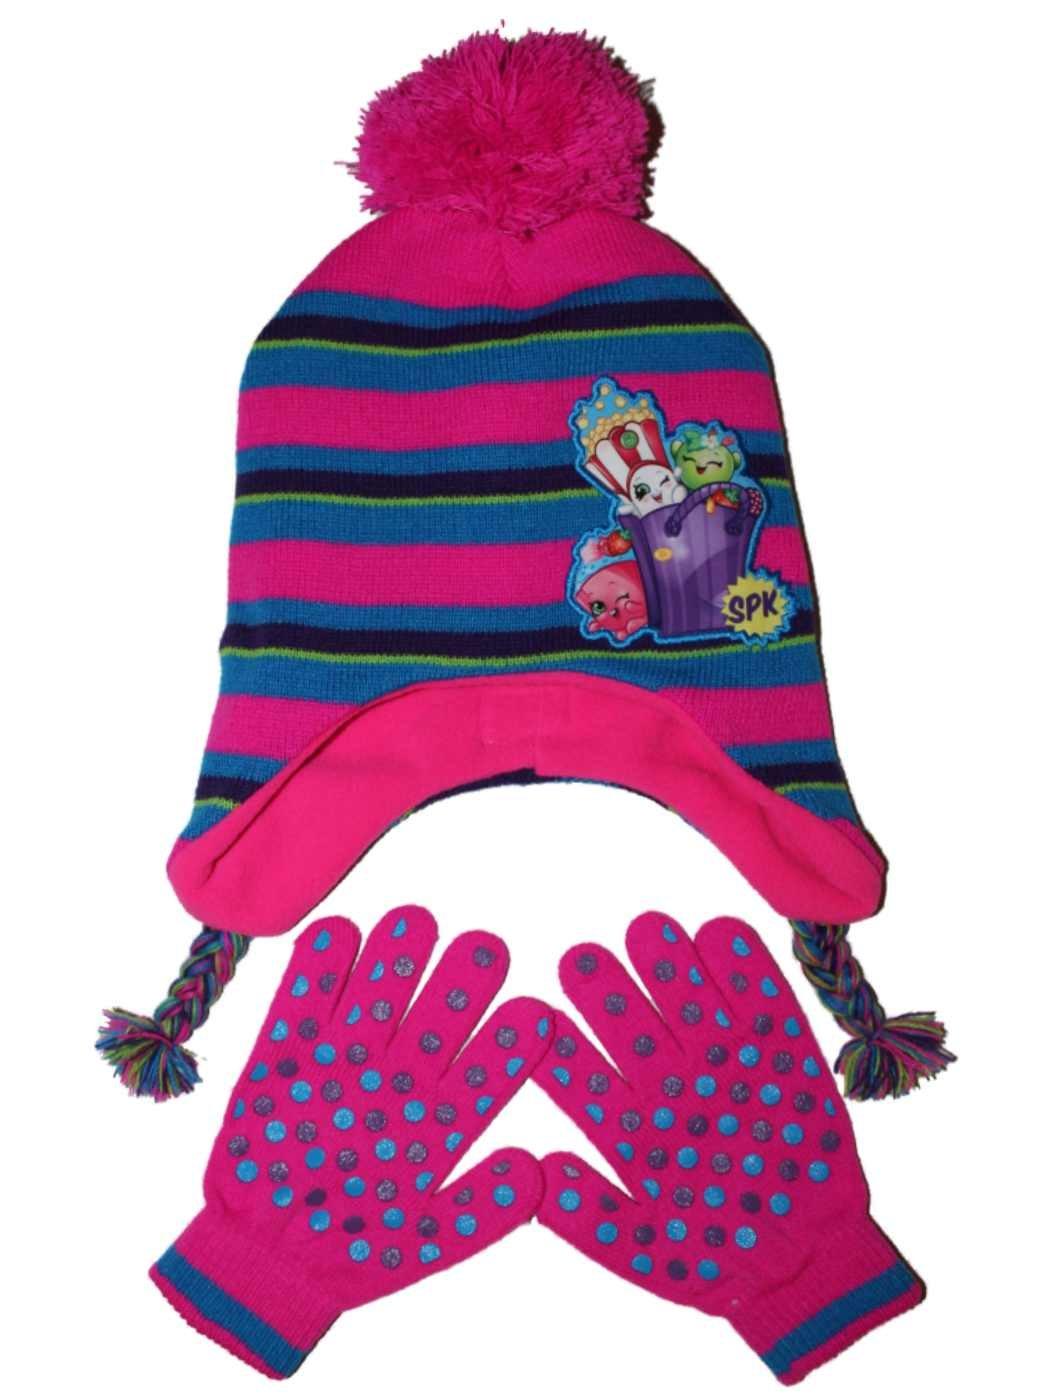 Shopkins Girls Hat and Gloves Set OSFM